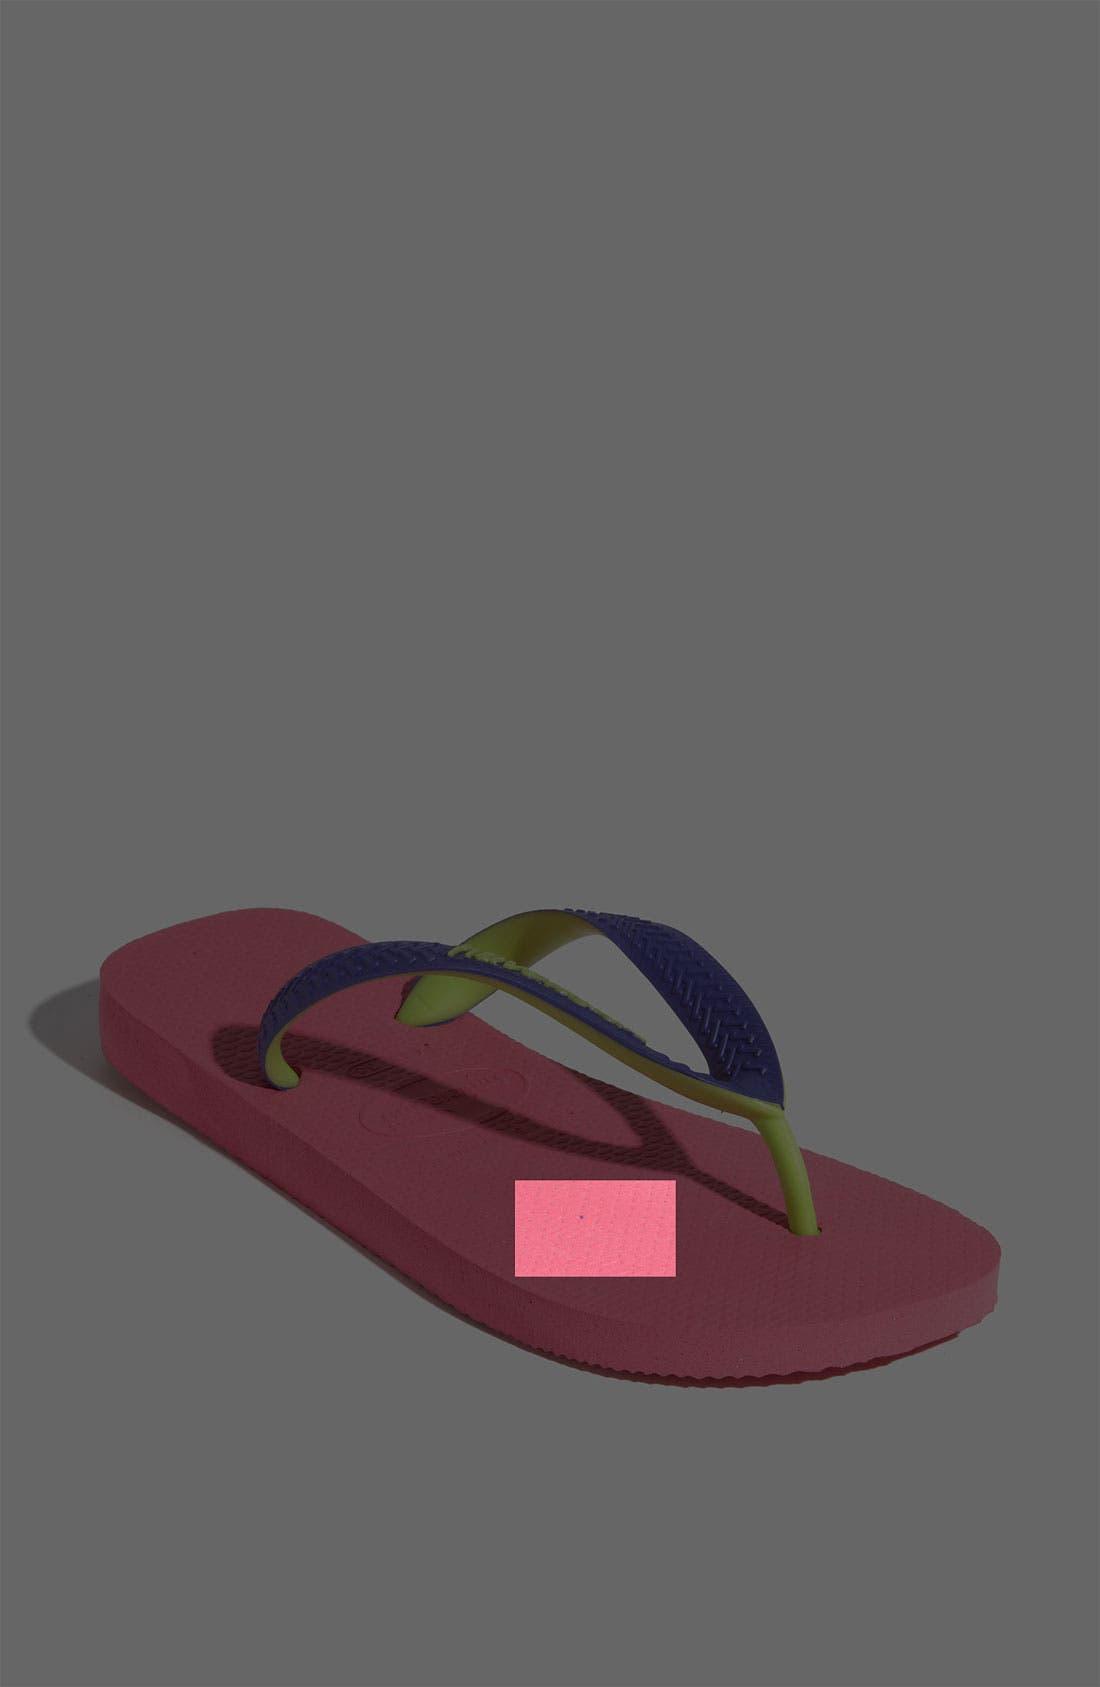 Alternate Image 1 Selected - Havaianas 'Top Mix' Flip Flop (Women)